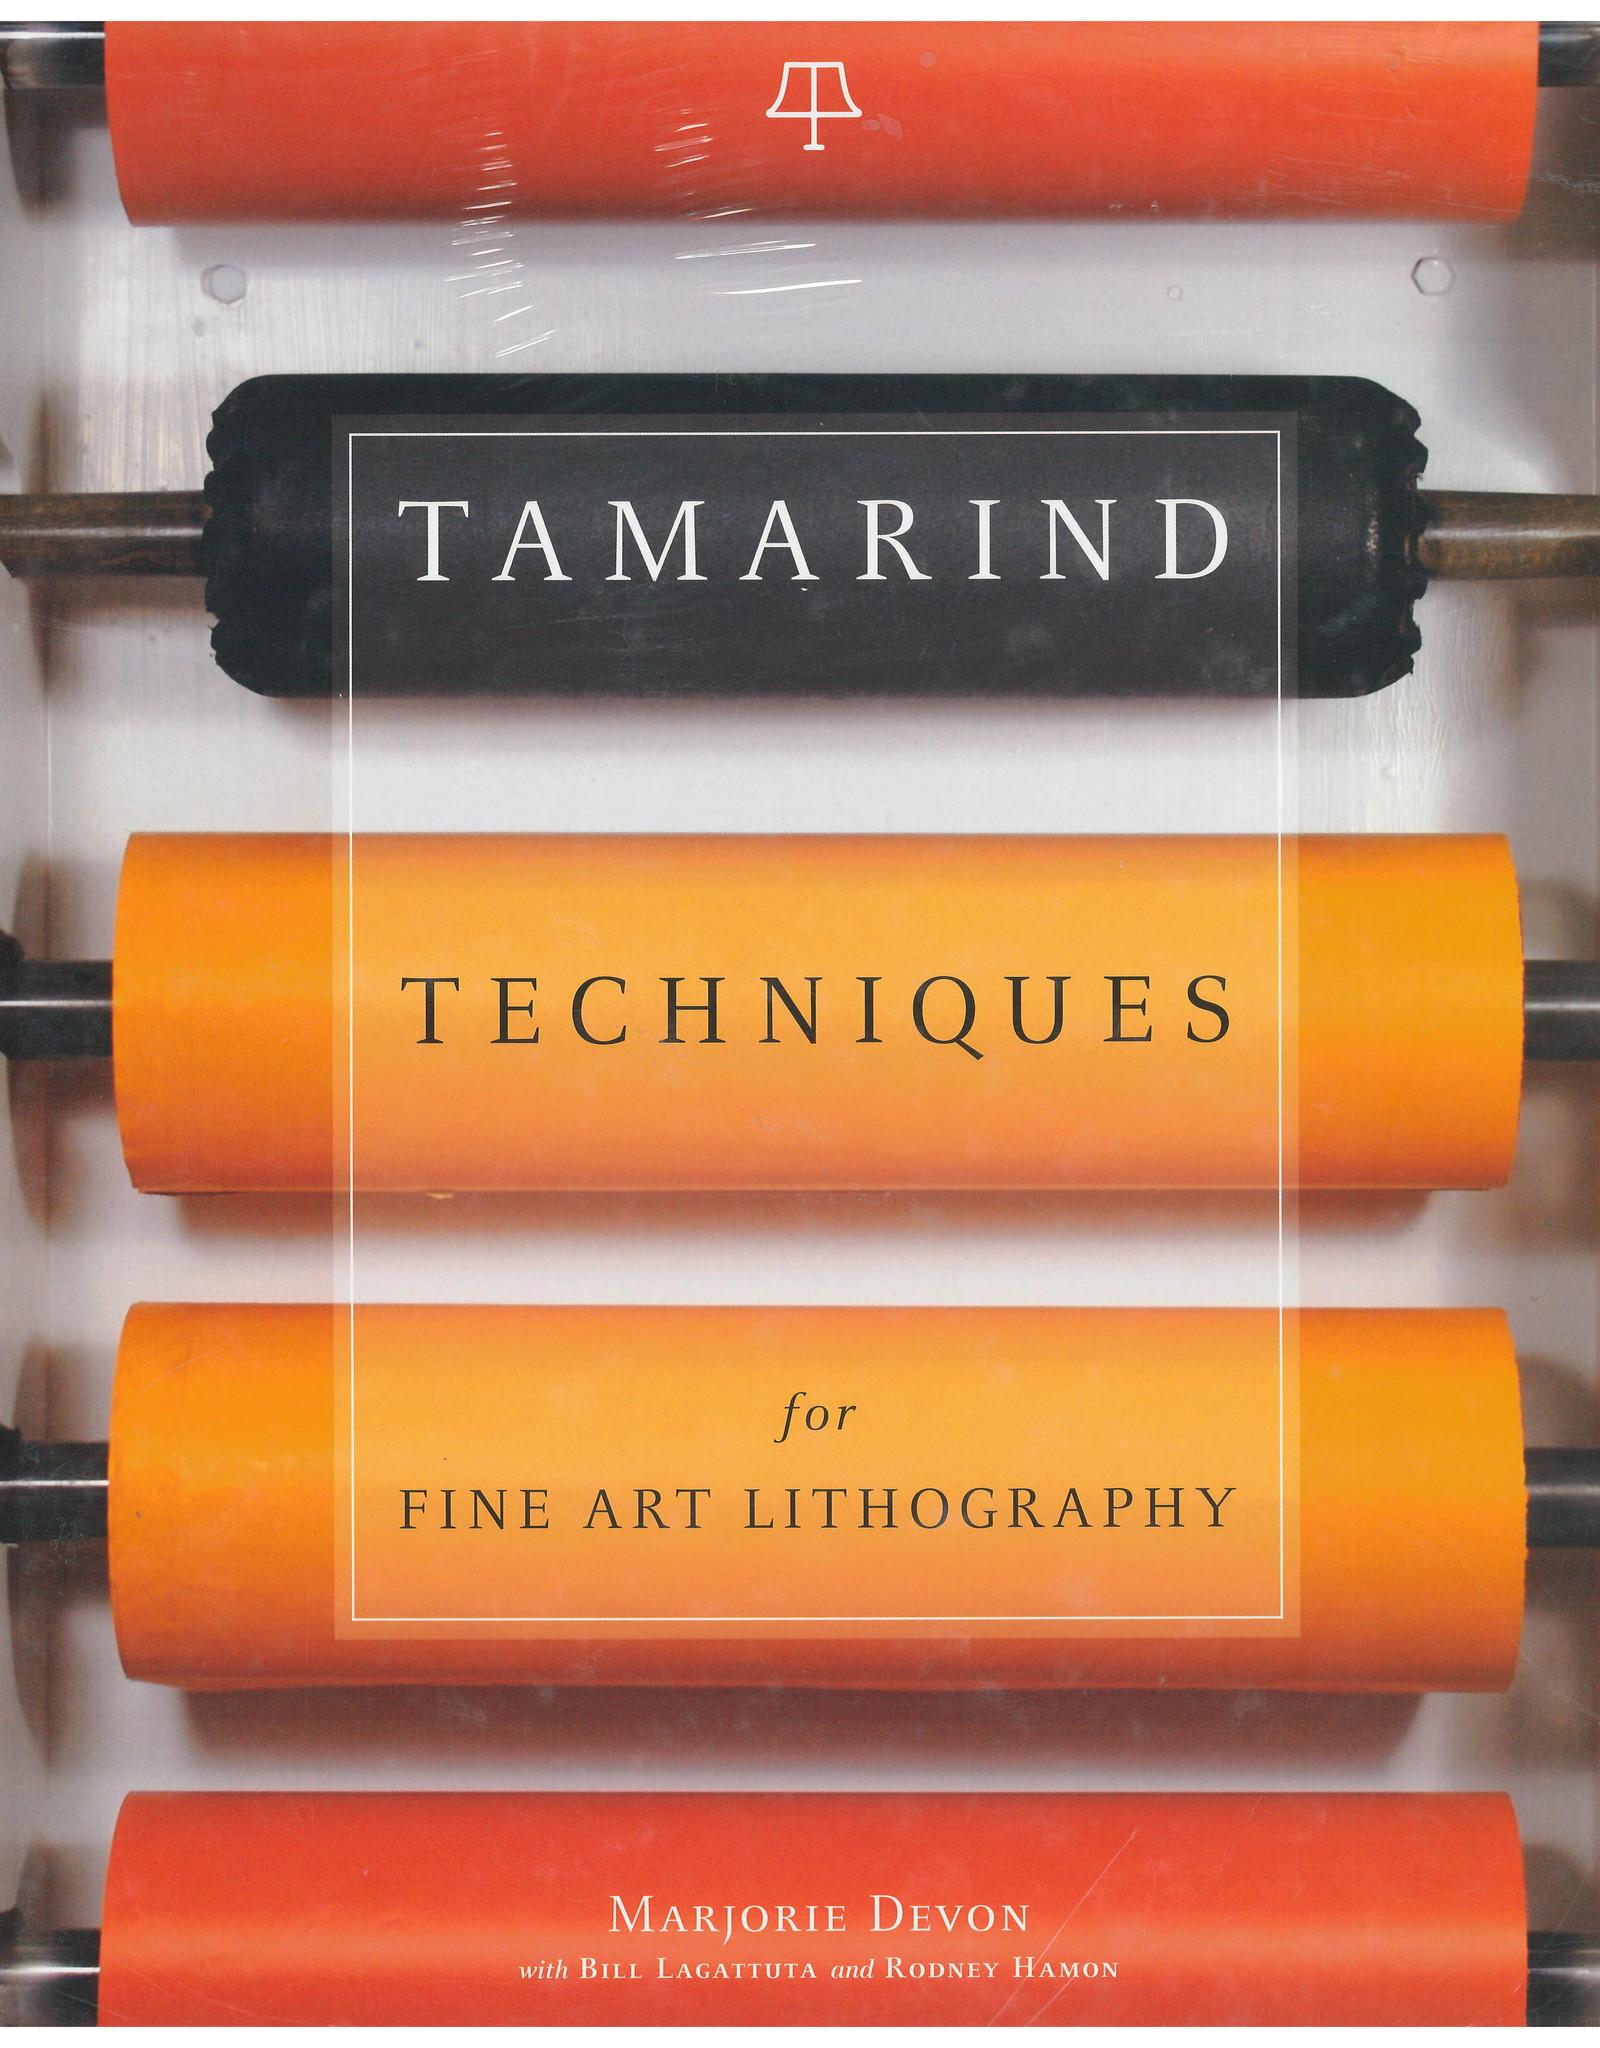 Tamarind: Techniques for Fine / Marjorie Devon